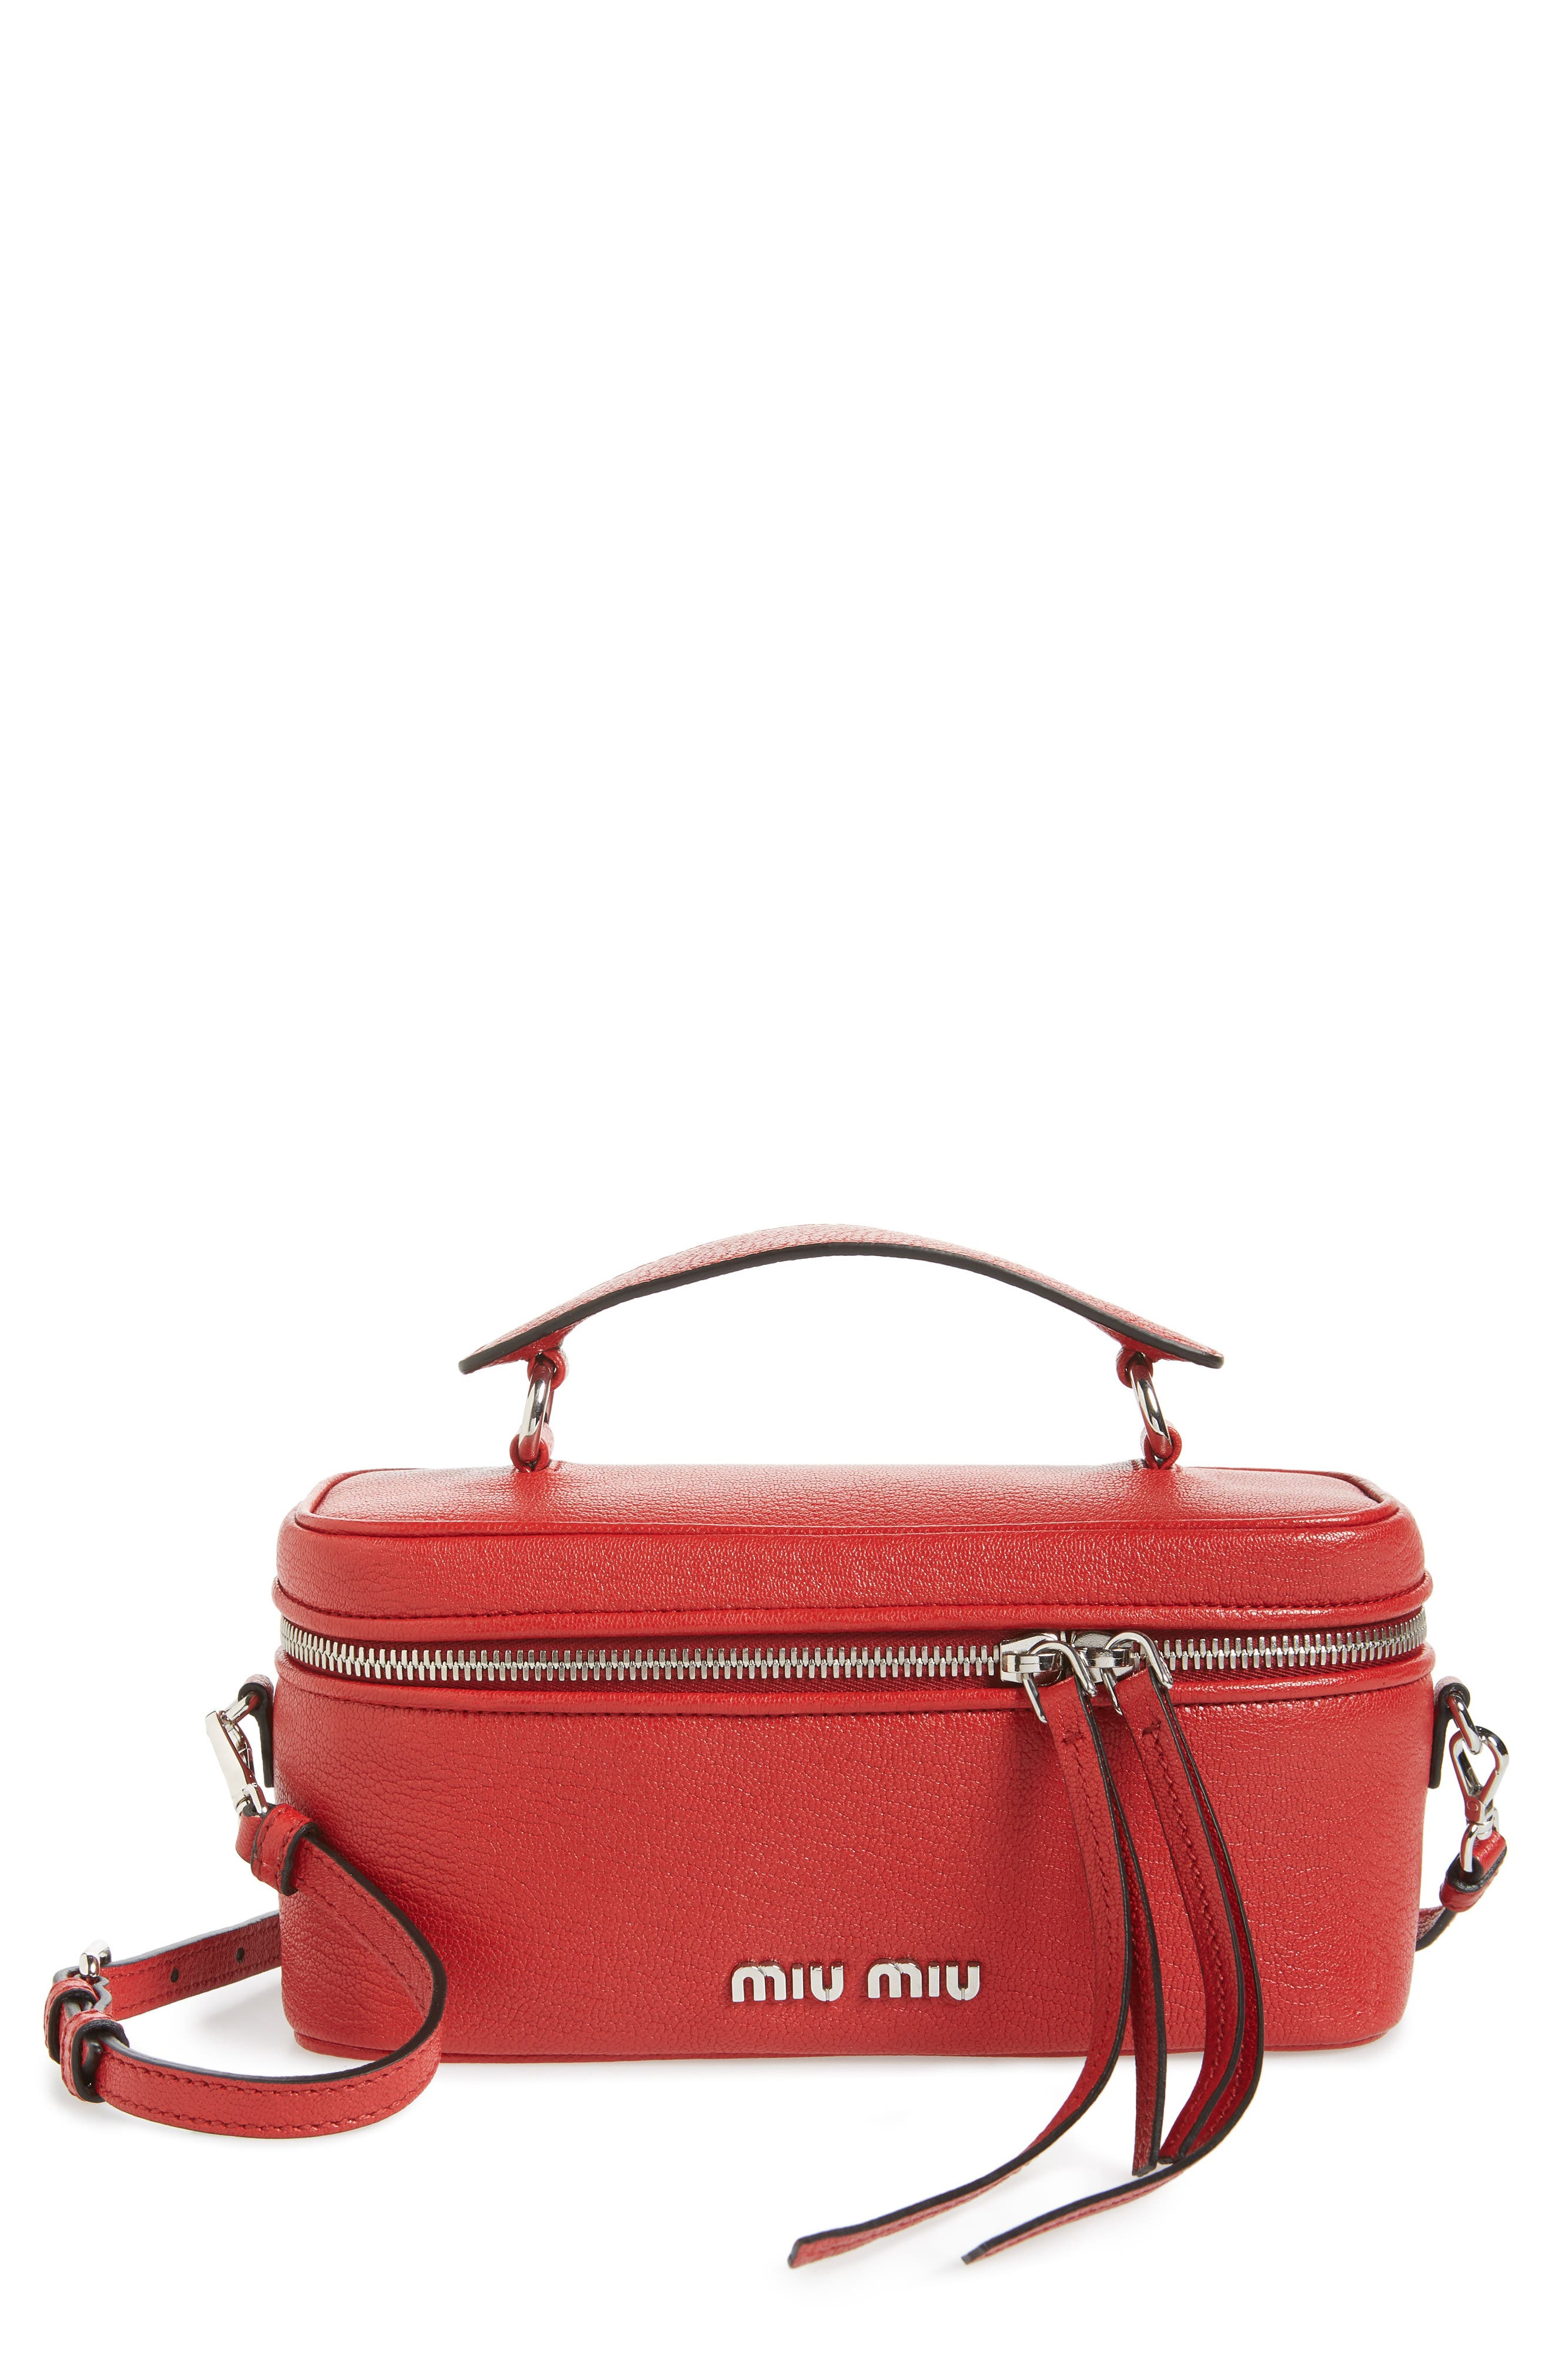 MIU MIU Leather Cosmetics Case in Fuoco